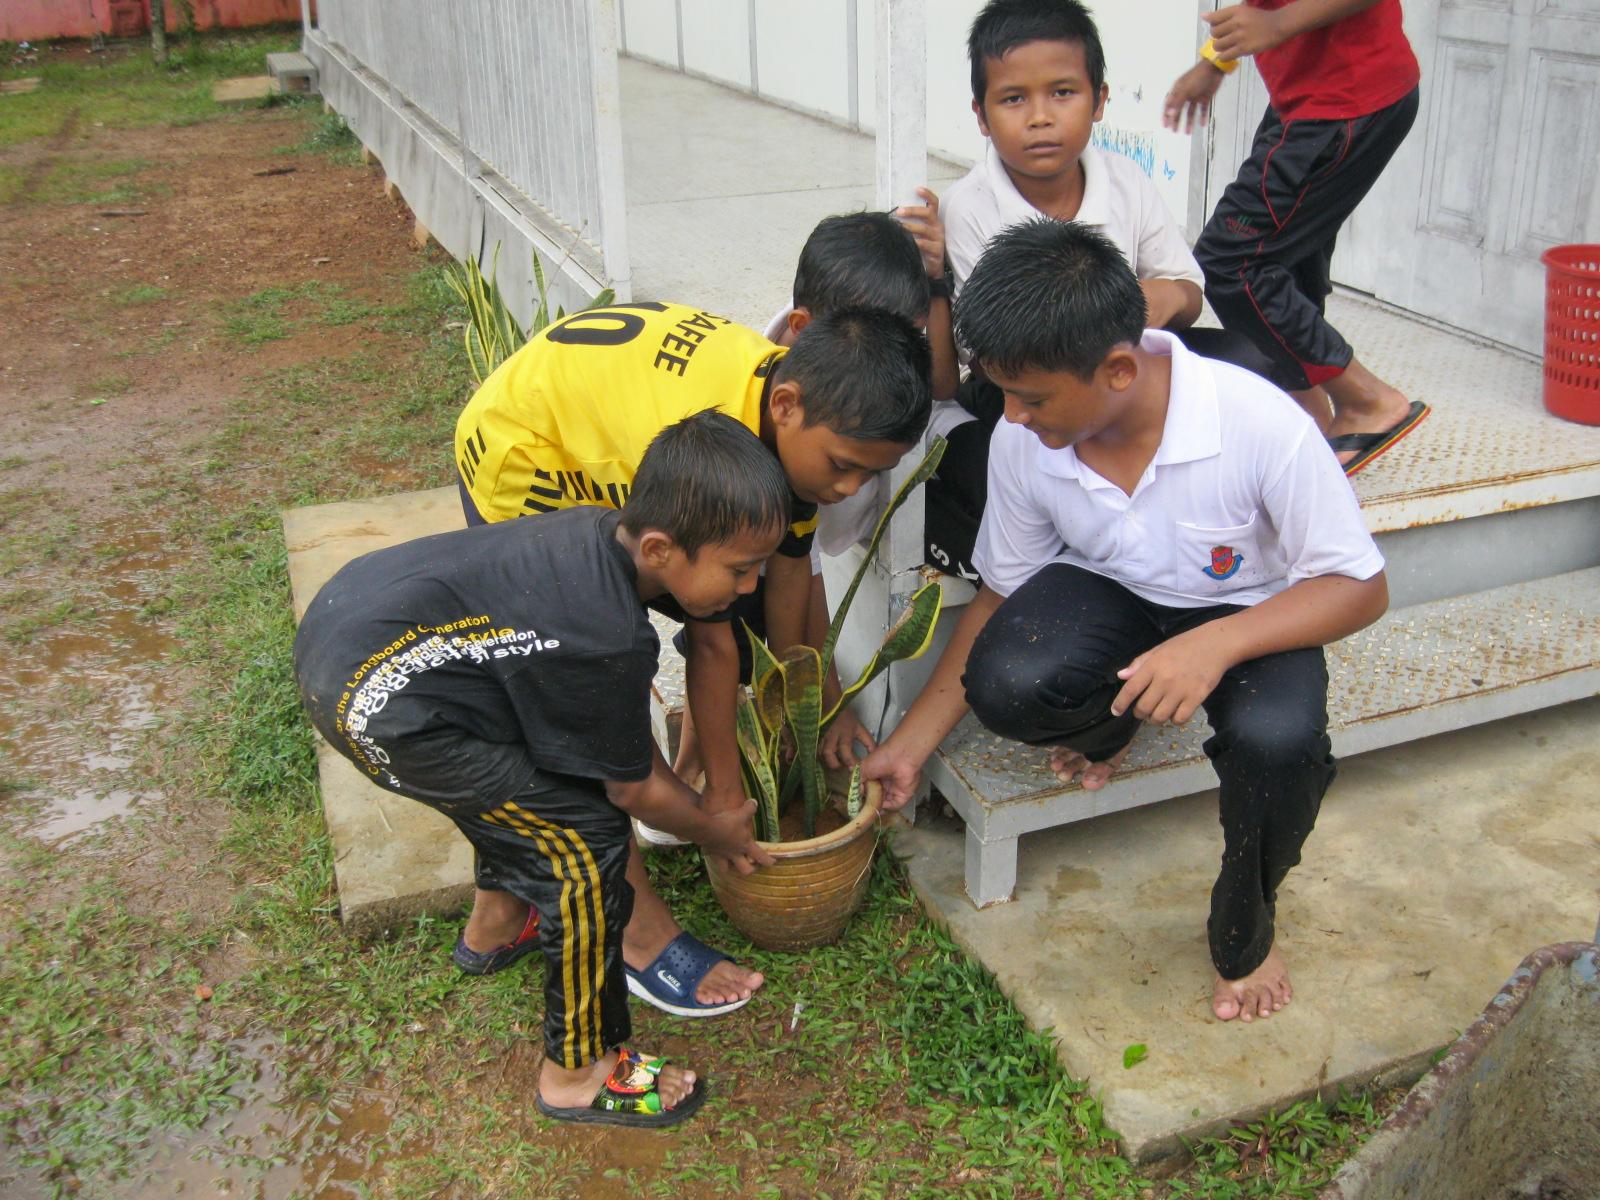 Pidato Gotong Royong Bahasa Sunda Contoh Naskah Pidato Bahasa Sunda